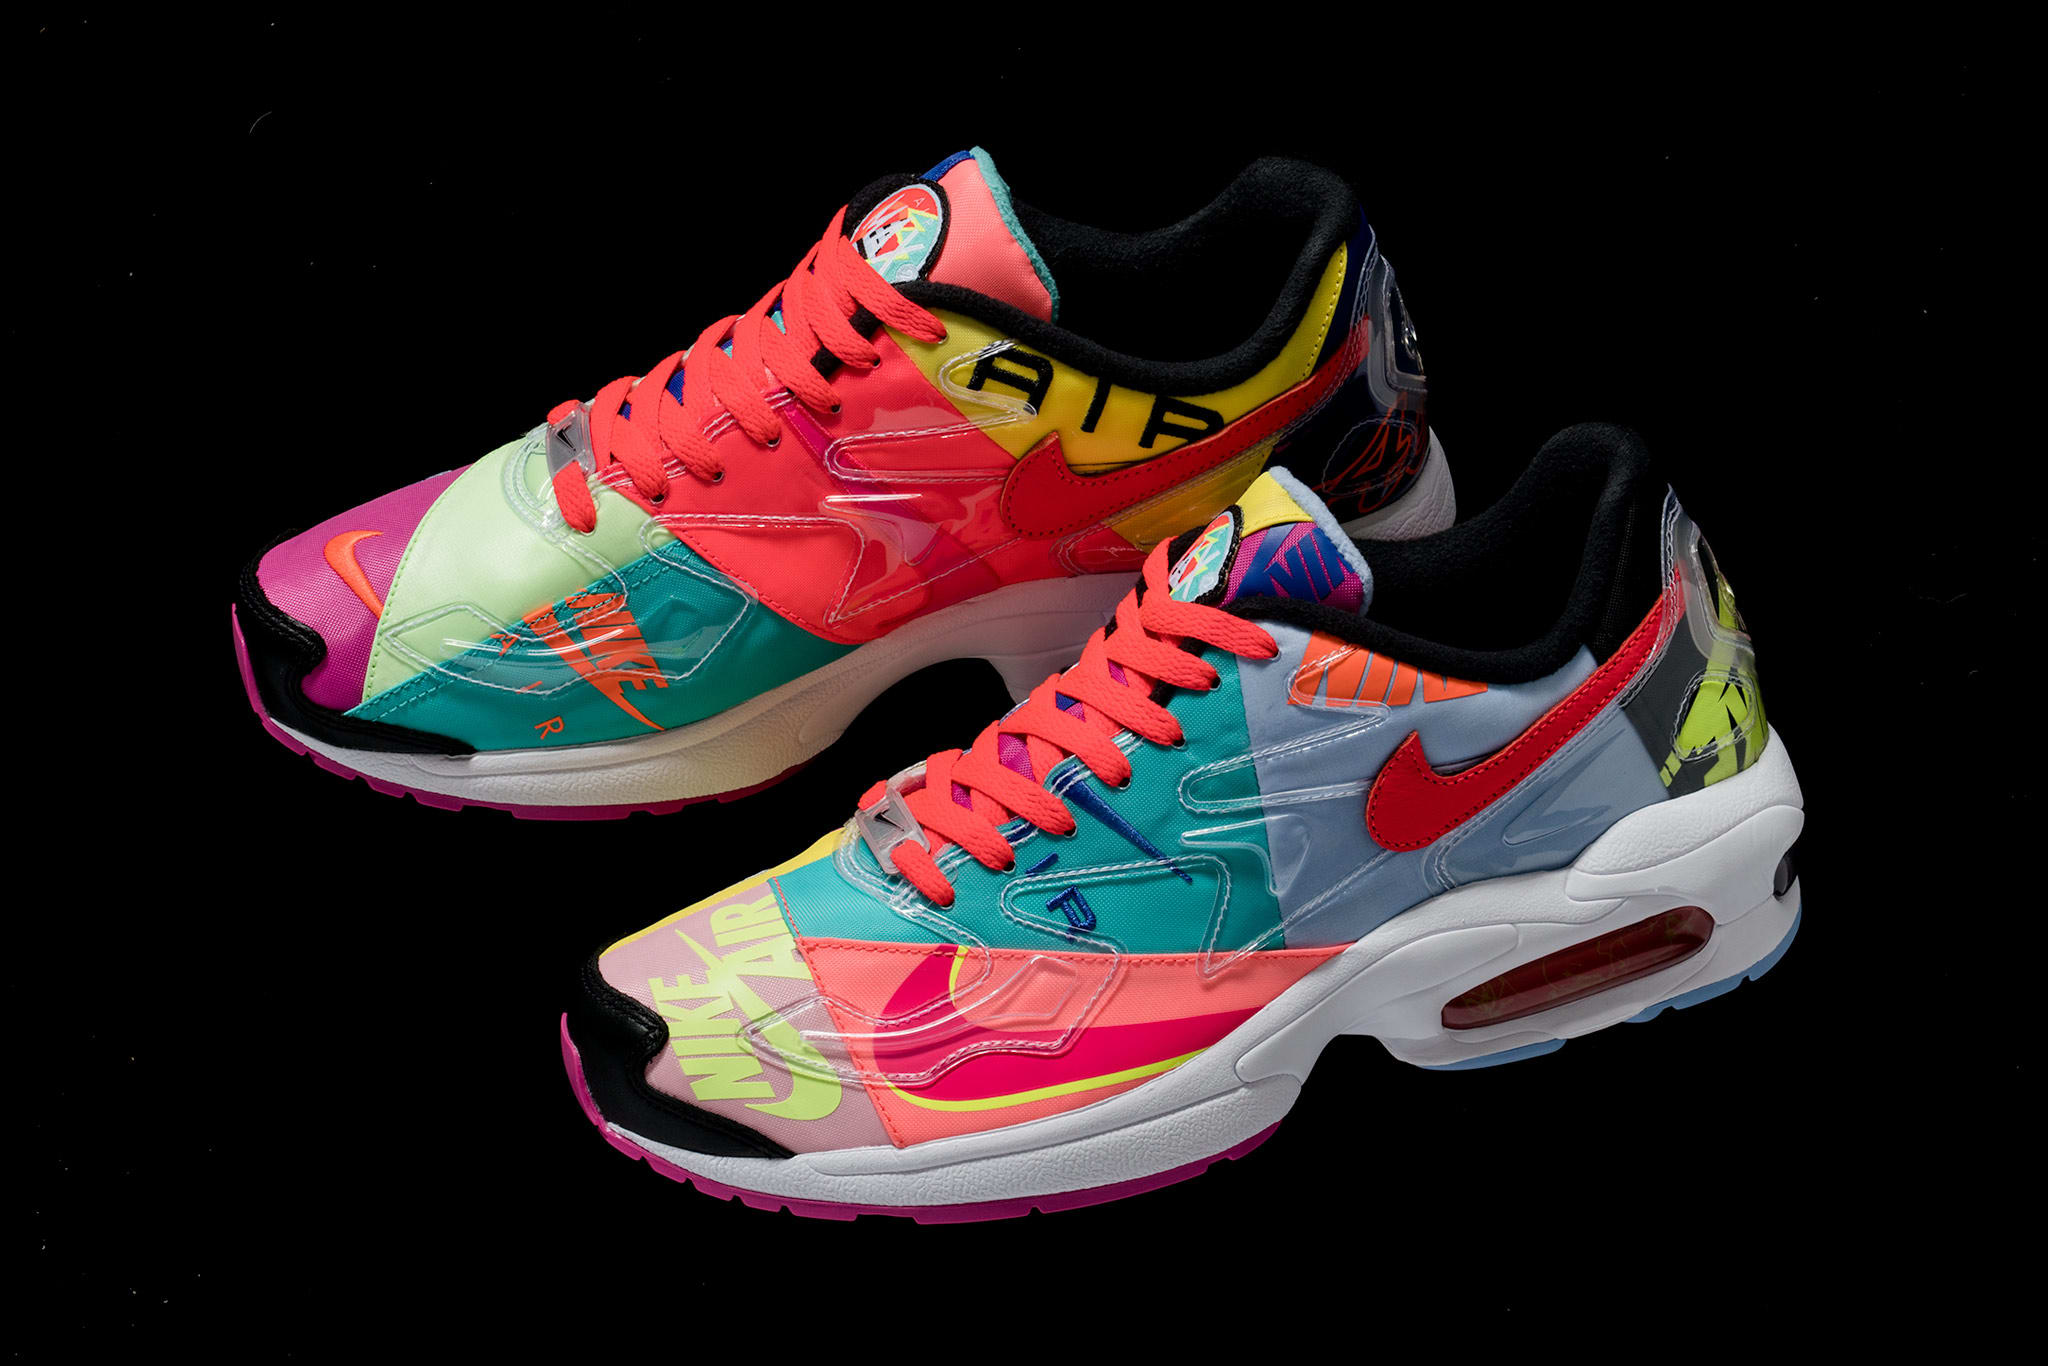 online store 90d8c ca026 HAVEN-NEWS-Nike-x-Atmos-Air-Max2-Light-WEB vrbevy.jpg